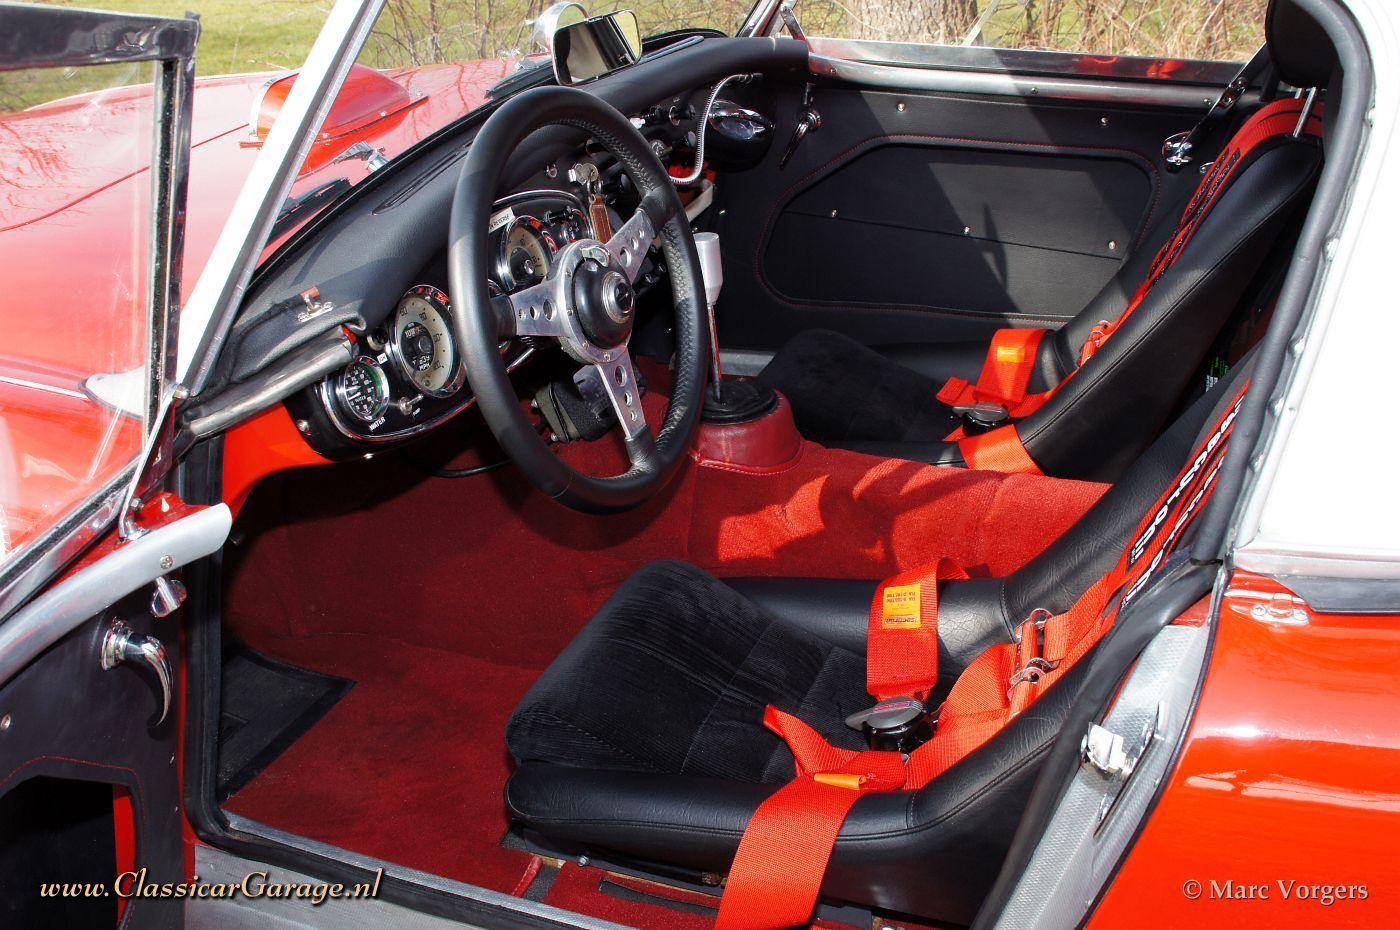 Car Garages Austin Healey 3000 Mk Ii Bn7 Rally Car 1962 Details